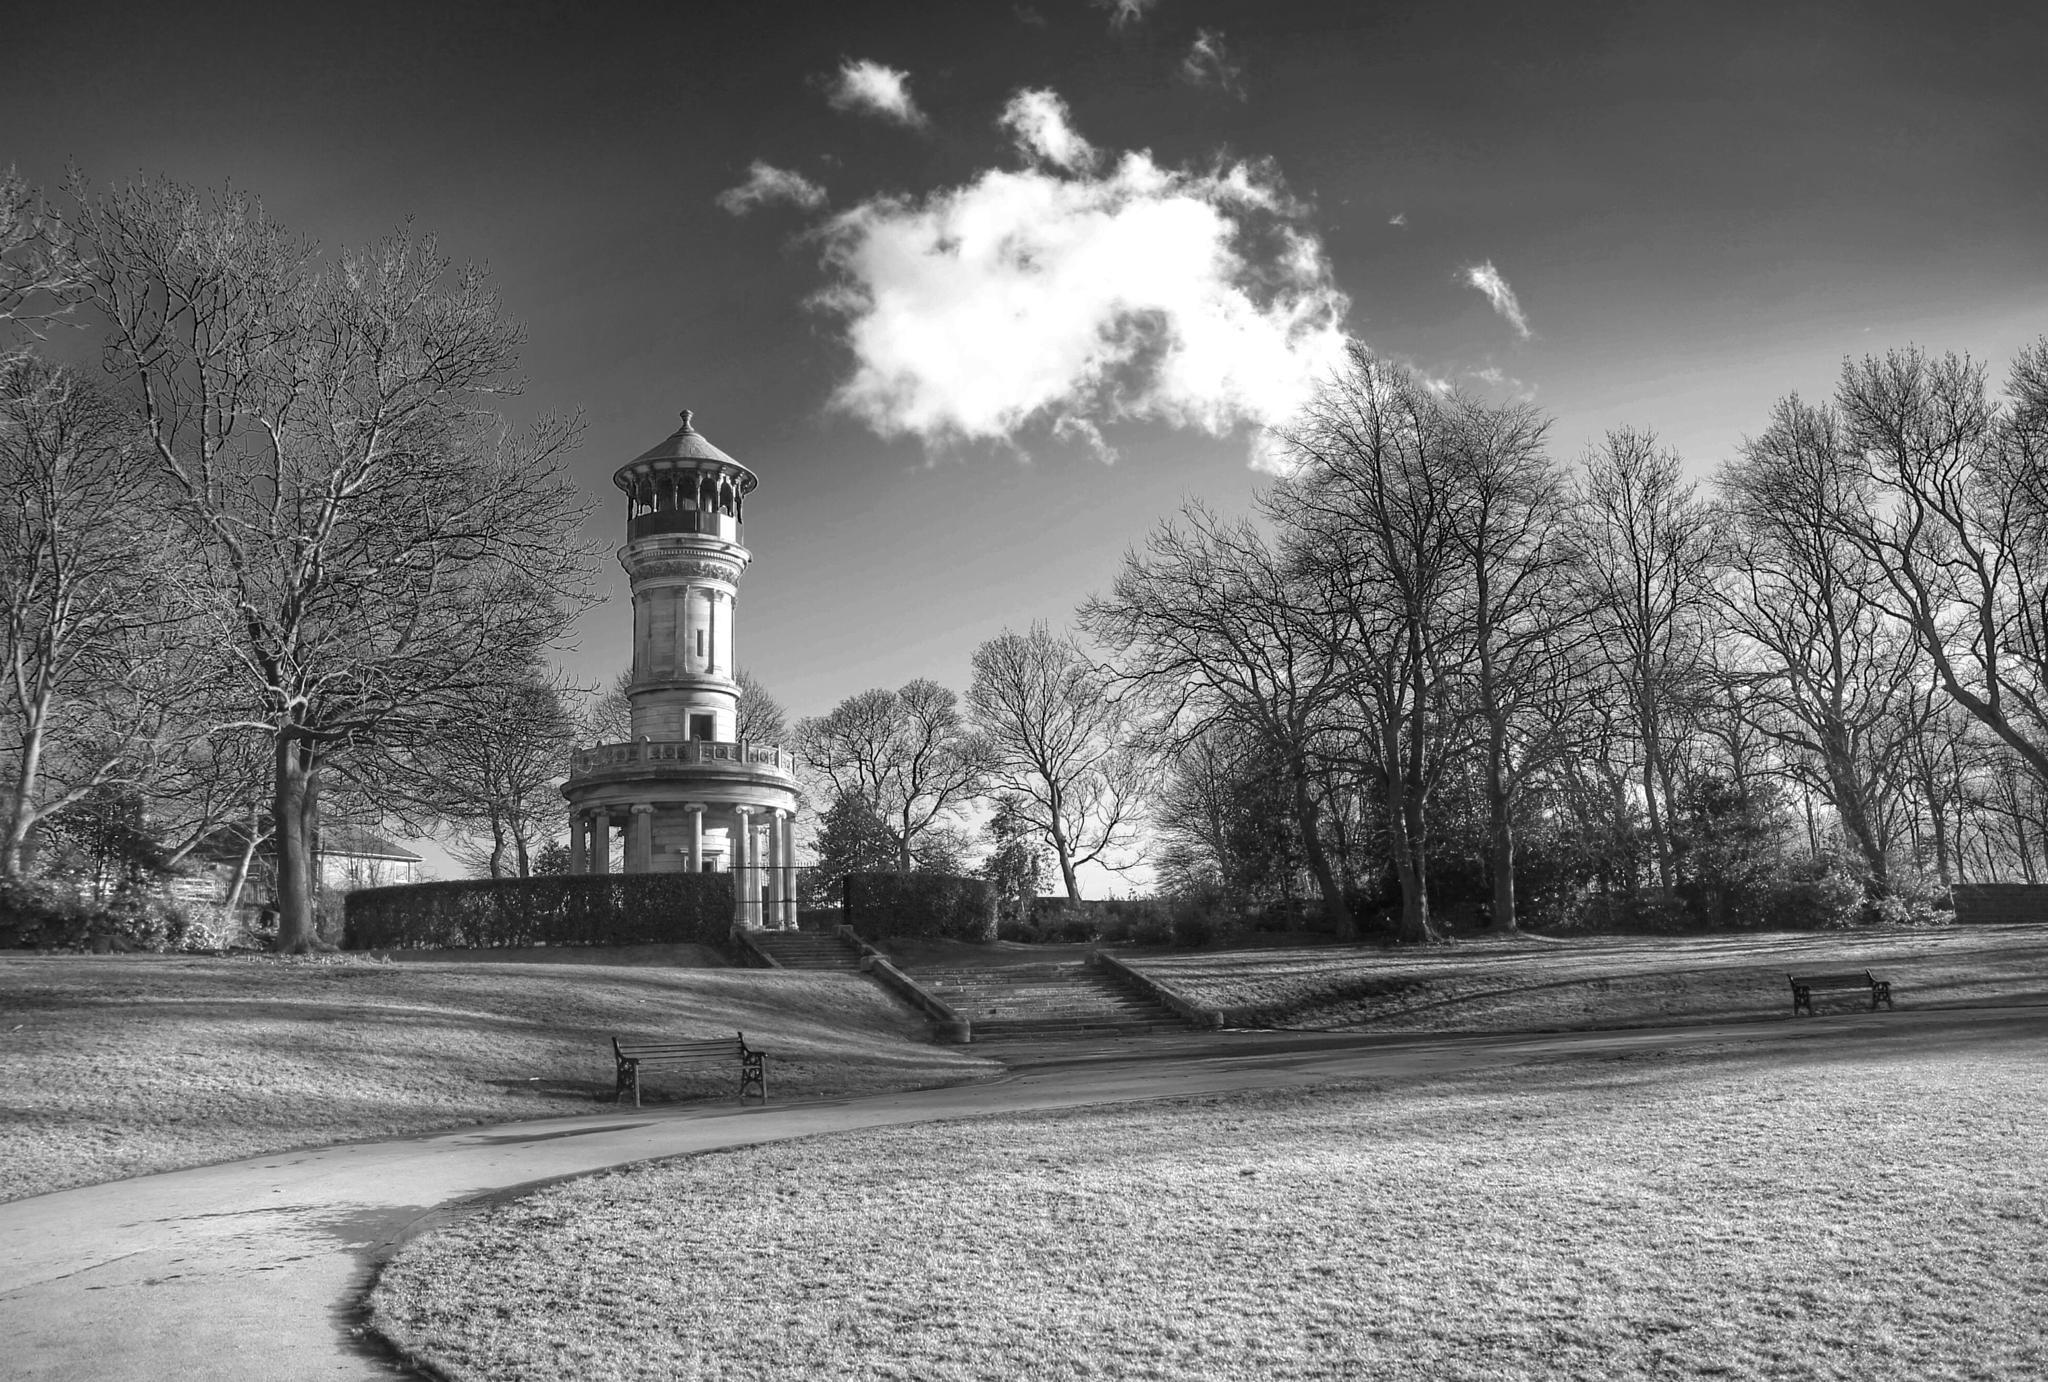 Locke Parke Tower III by Robert Carter